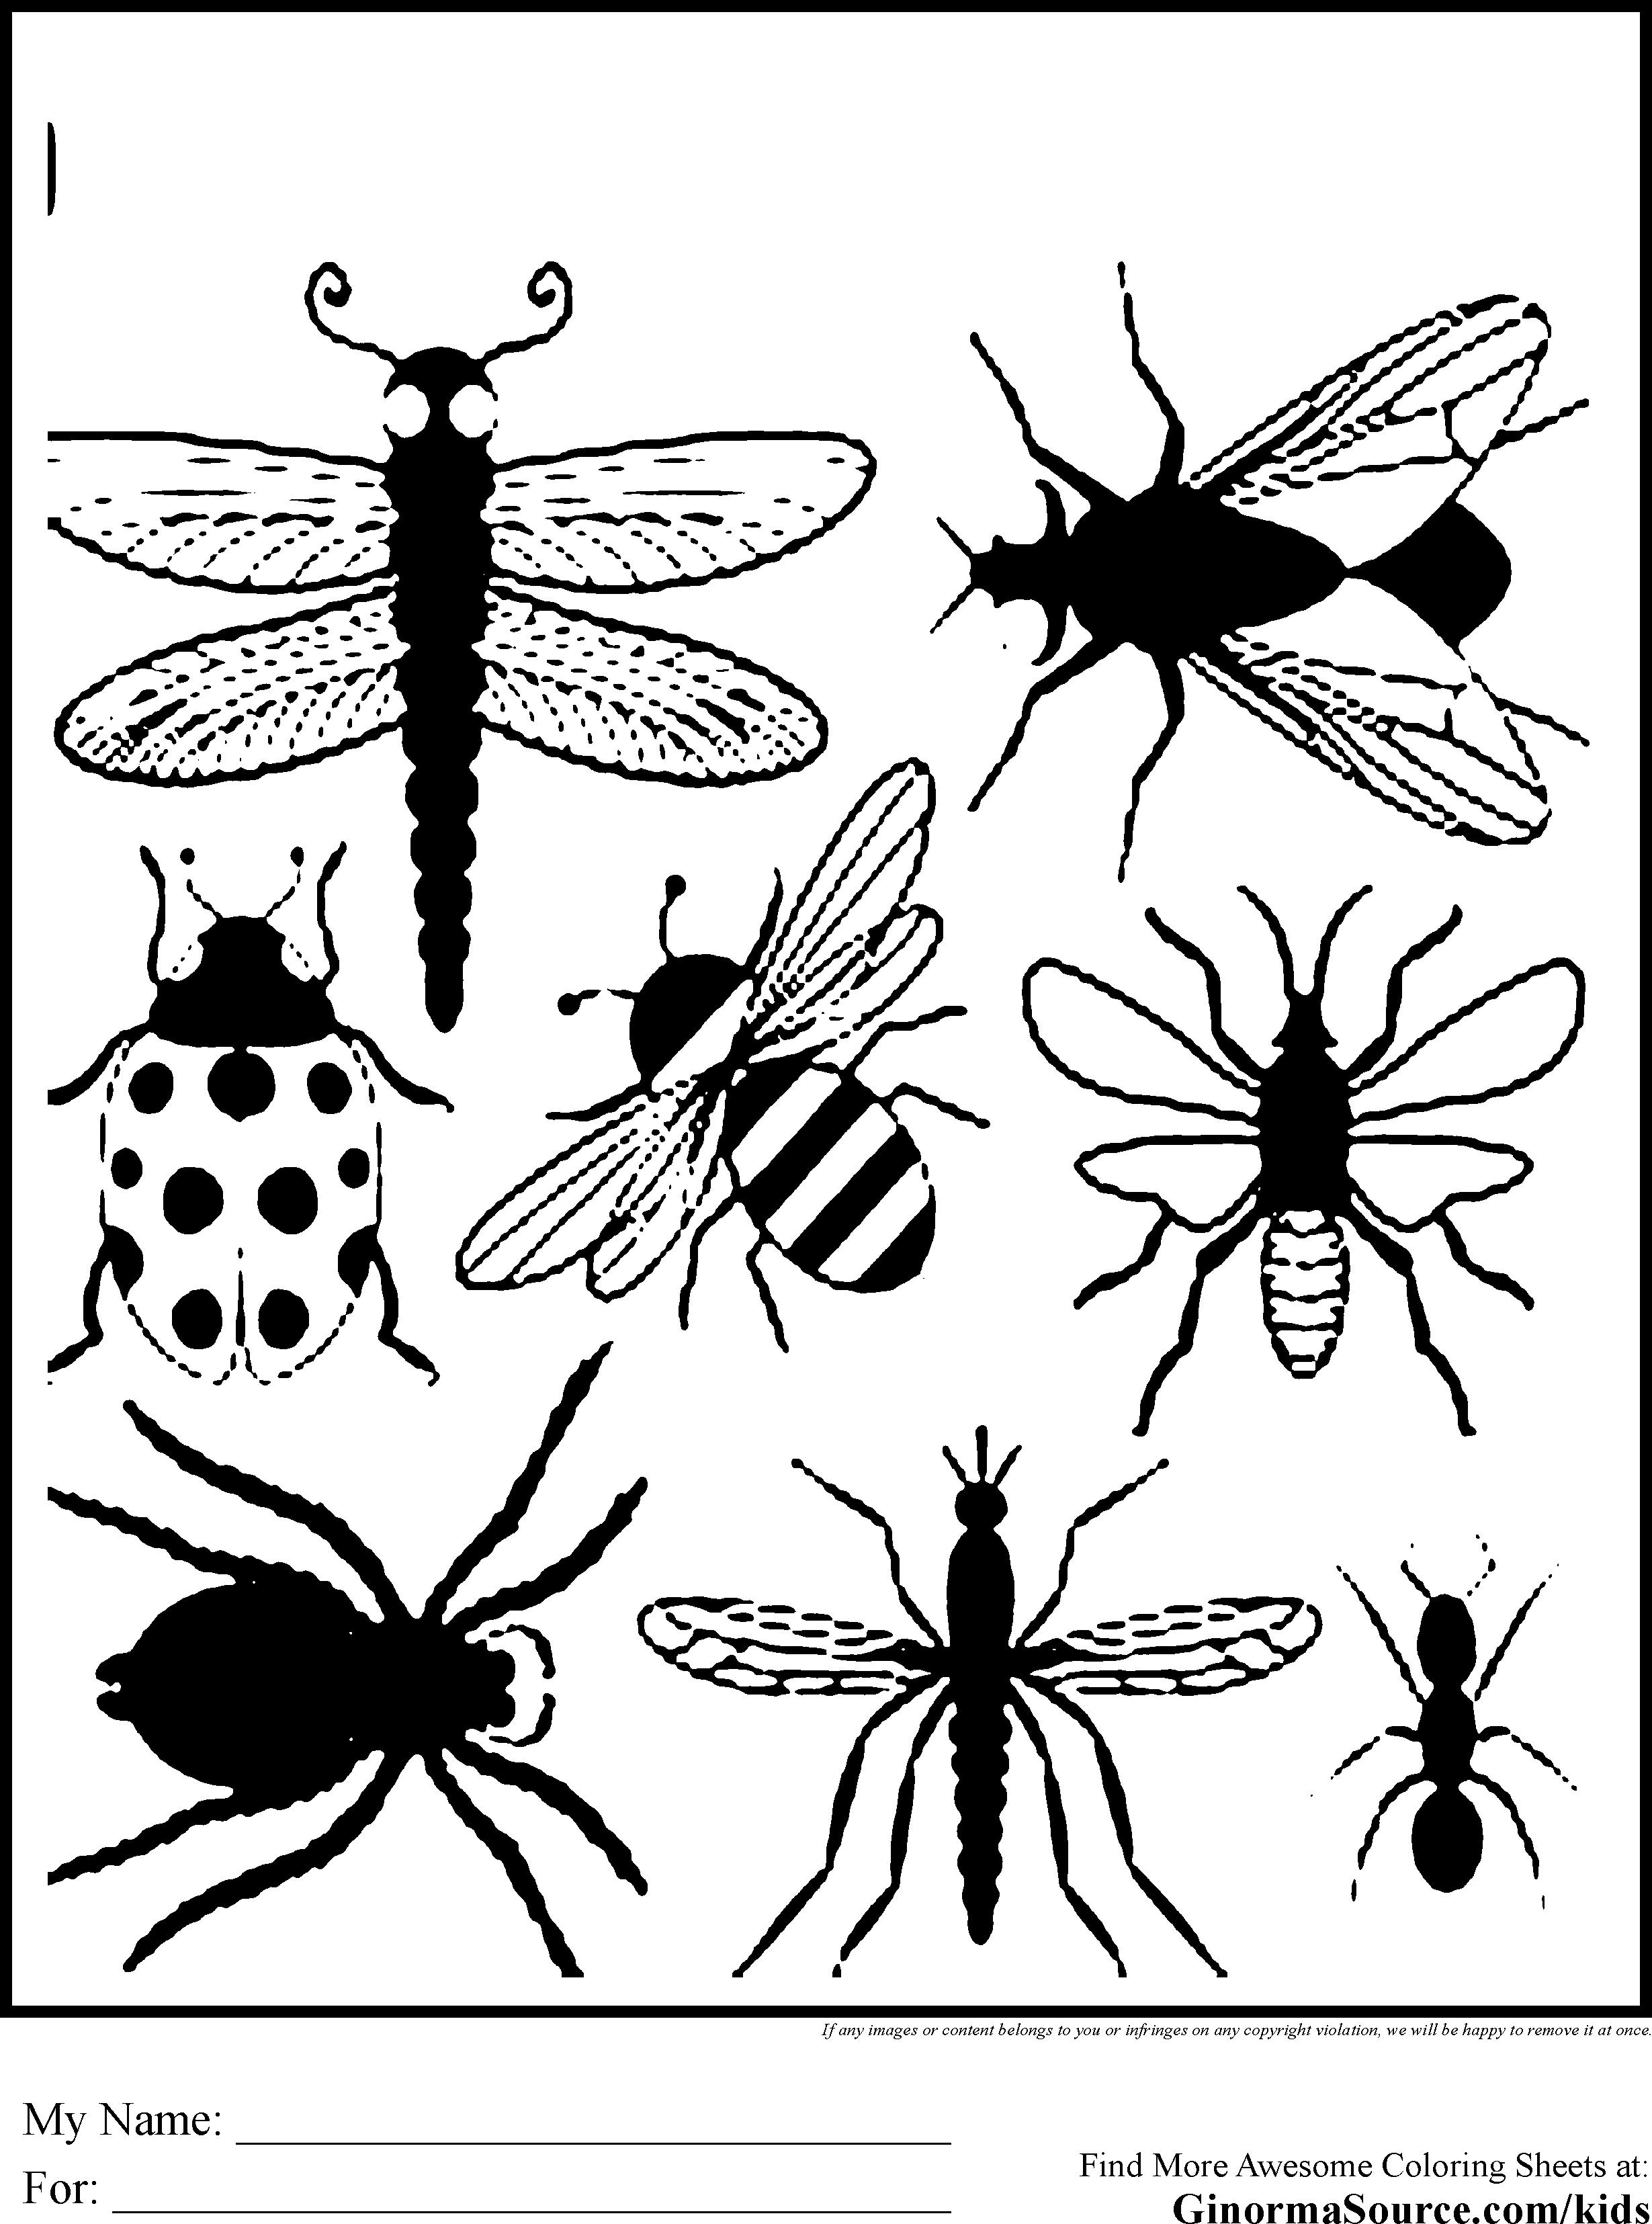 Previous Next October David Bug Coloring Pages Printable